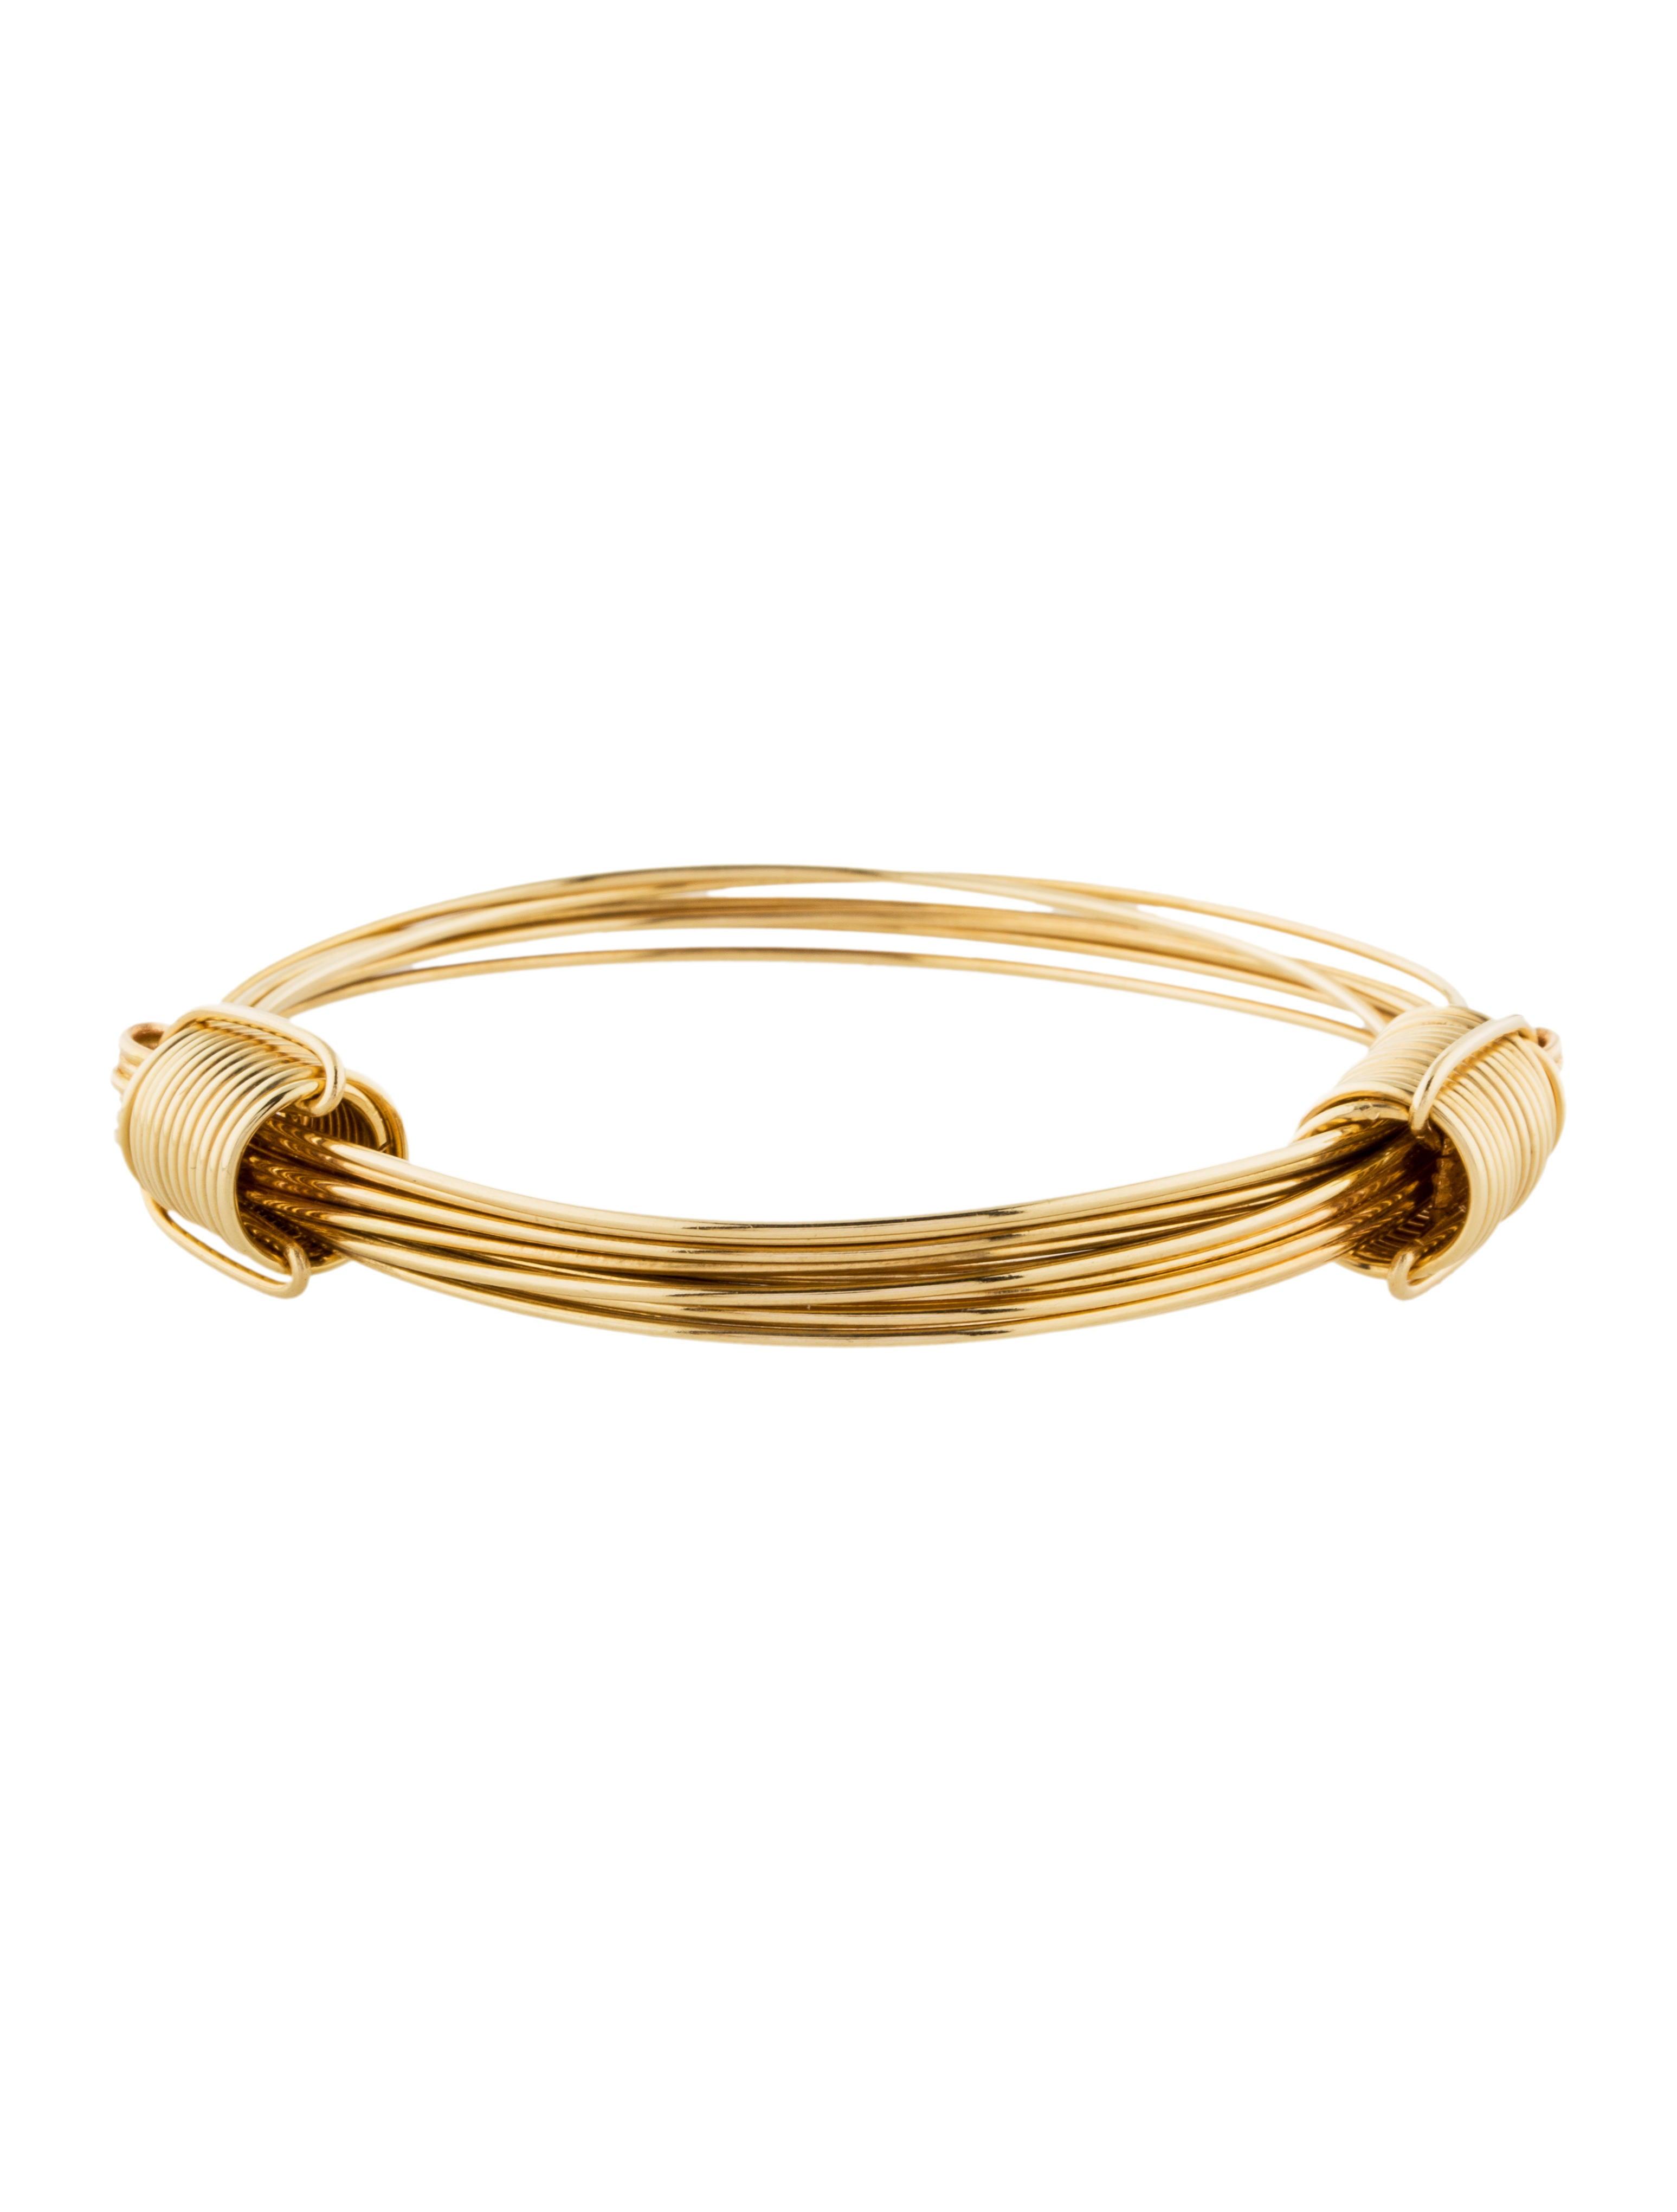 14k expandable bangle bracelets brace26808 the realreal